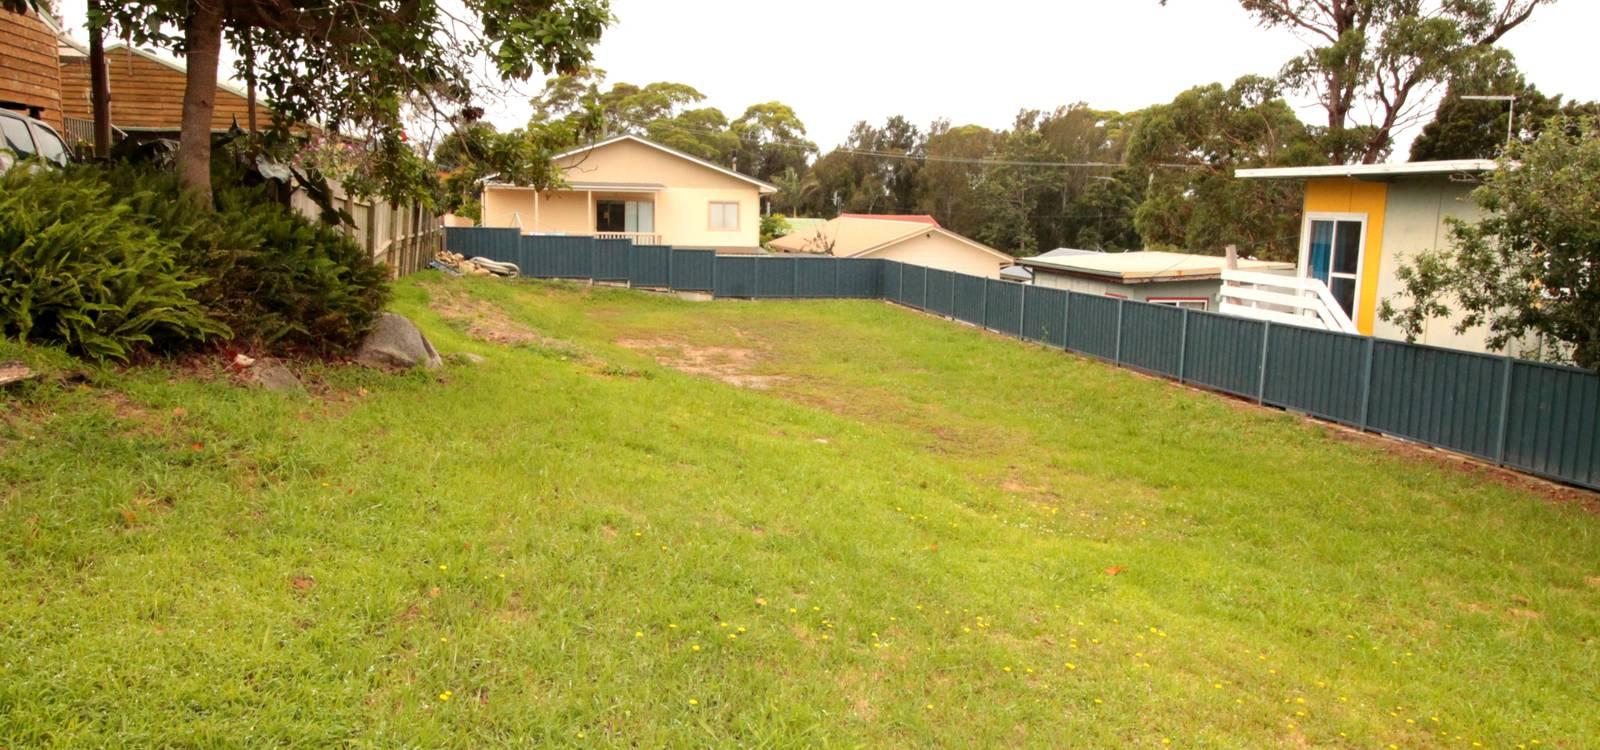 6 Bondi Street TUROSS HEAD, NSW 2537 - photo 1